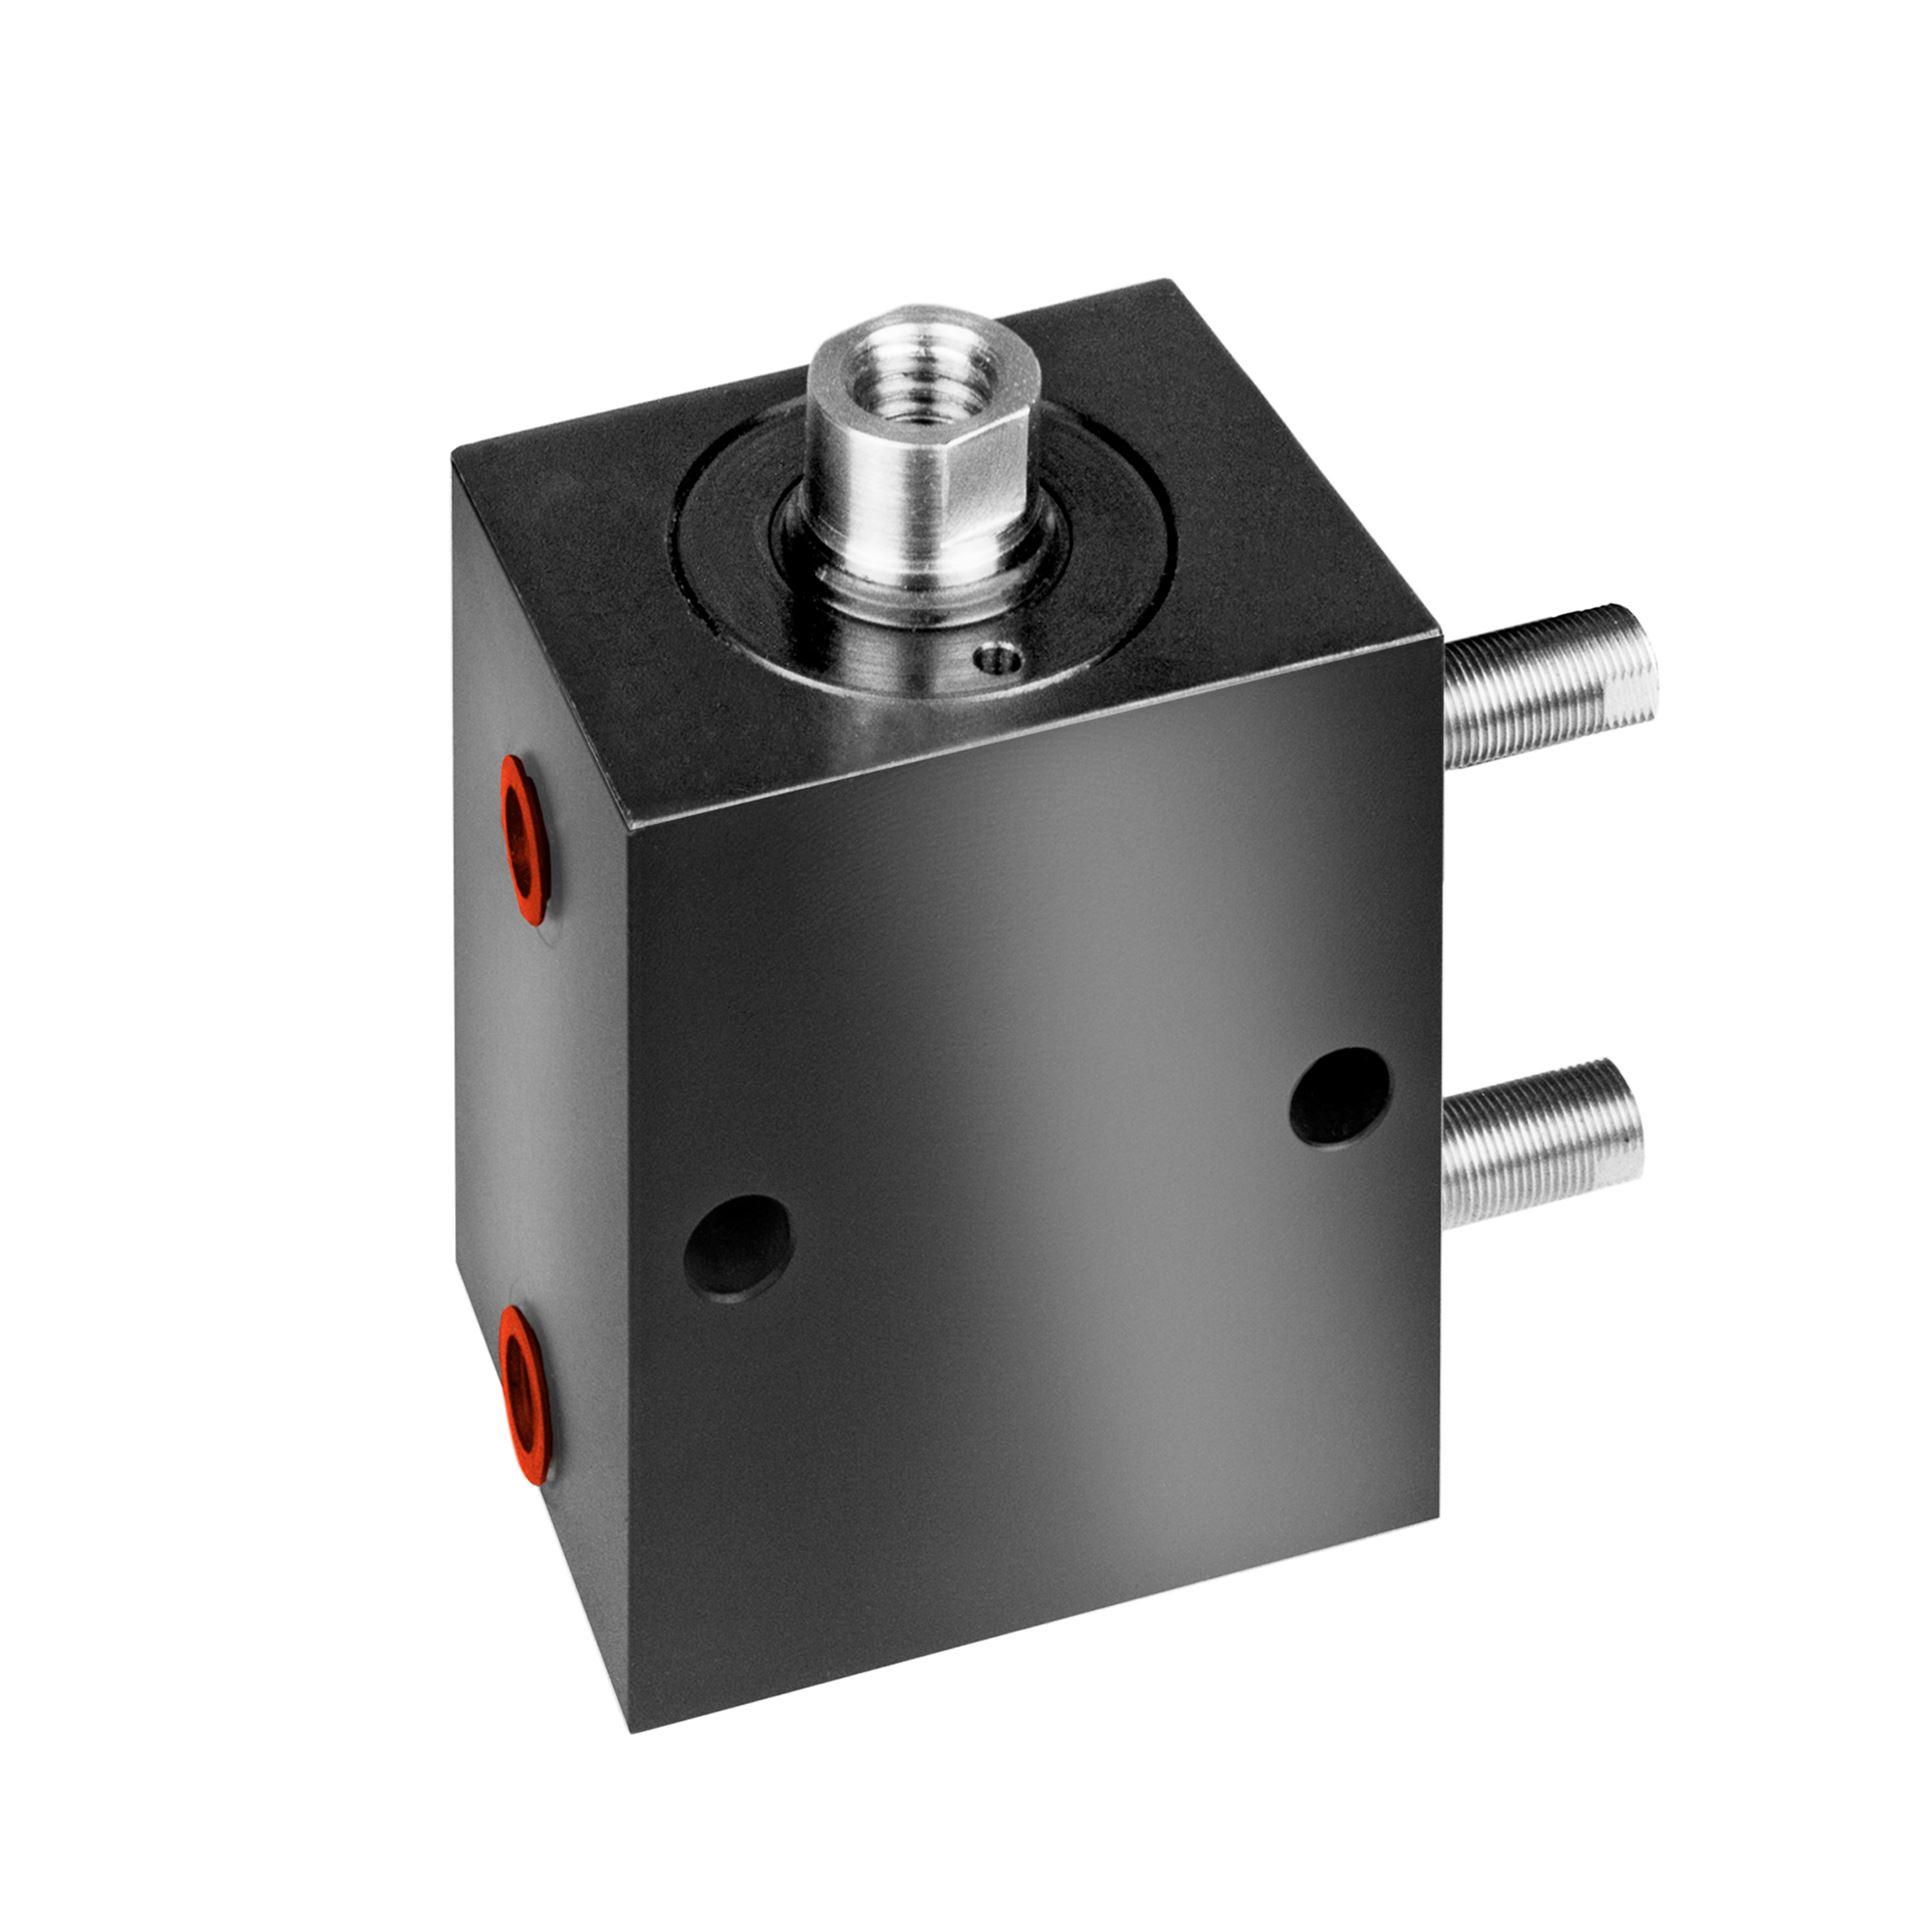 Locking cylinder VBZNI250 and VBVNI250